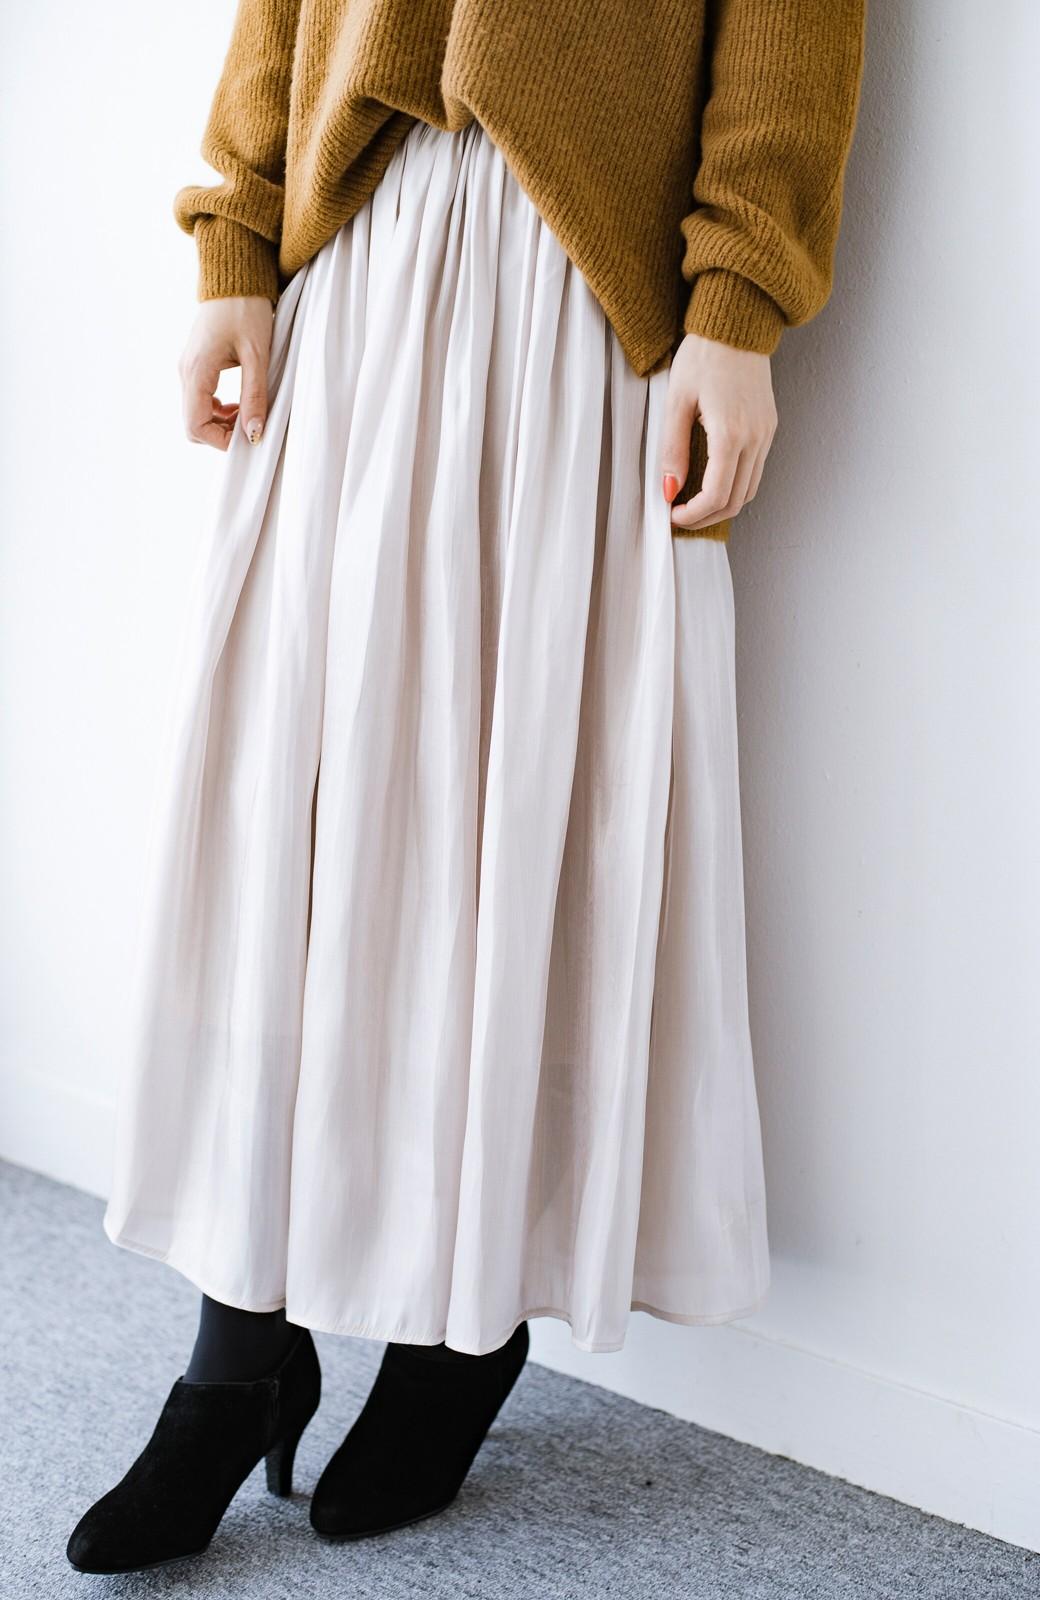 haco! 【人気のため新色追加!】1枚でも重ね着にも便利なキラキラ素材がかわいいロングスカート by laulea <アイボリー>の商品写真1